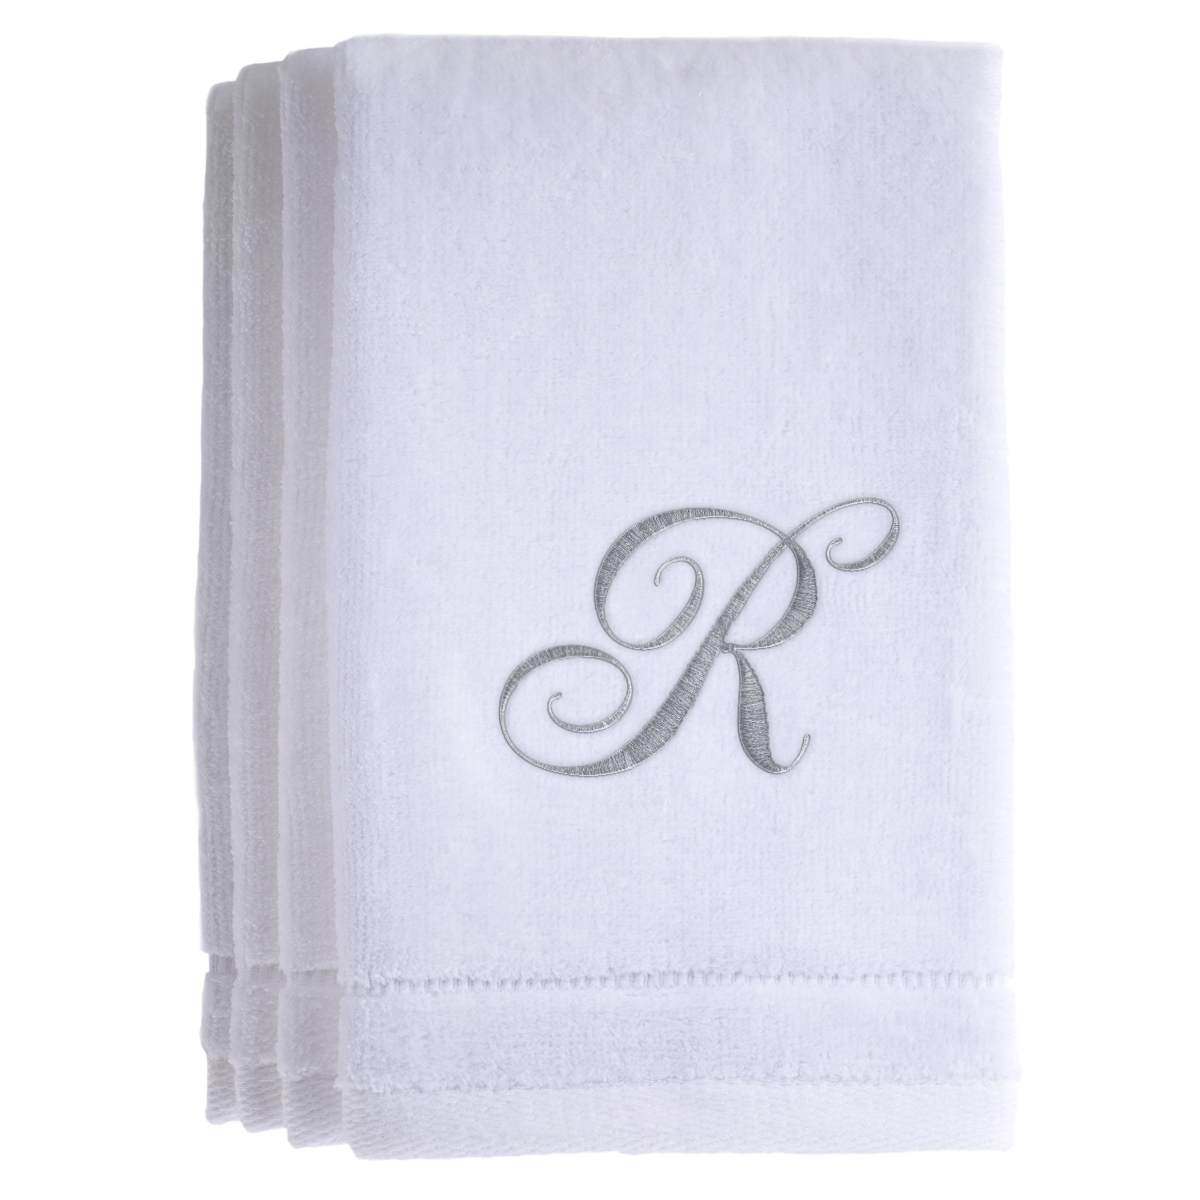 Deon Reviews 4U: Monogrammed Towels Set Of 4 Initial R (White